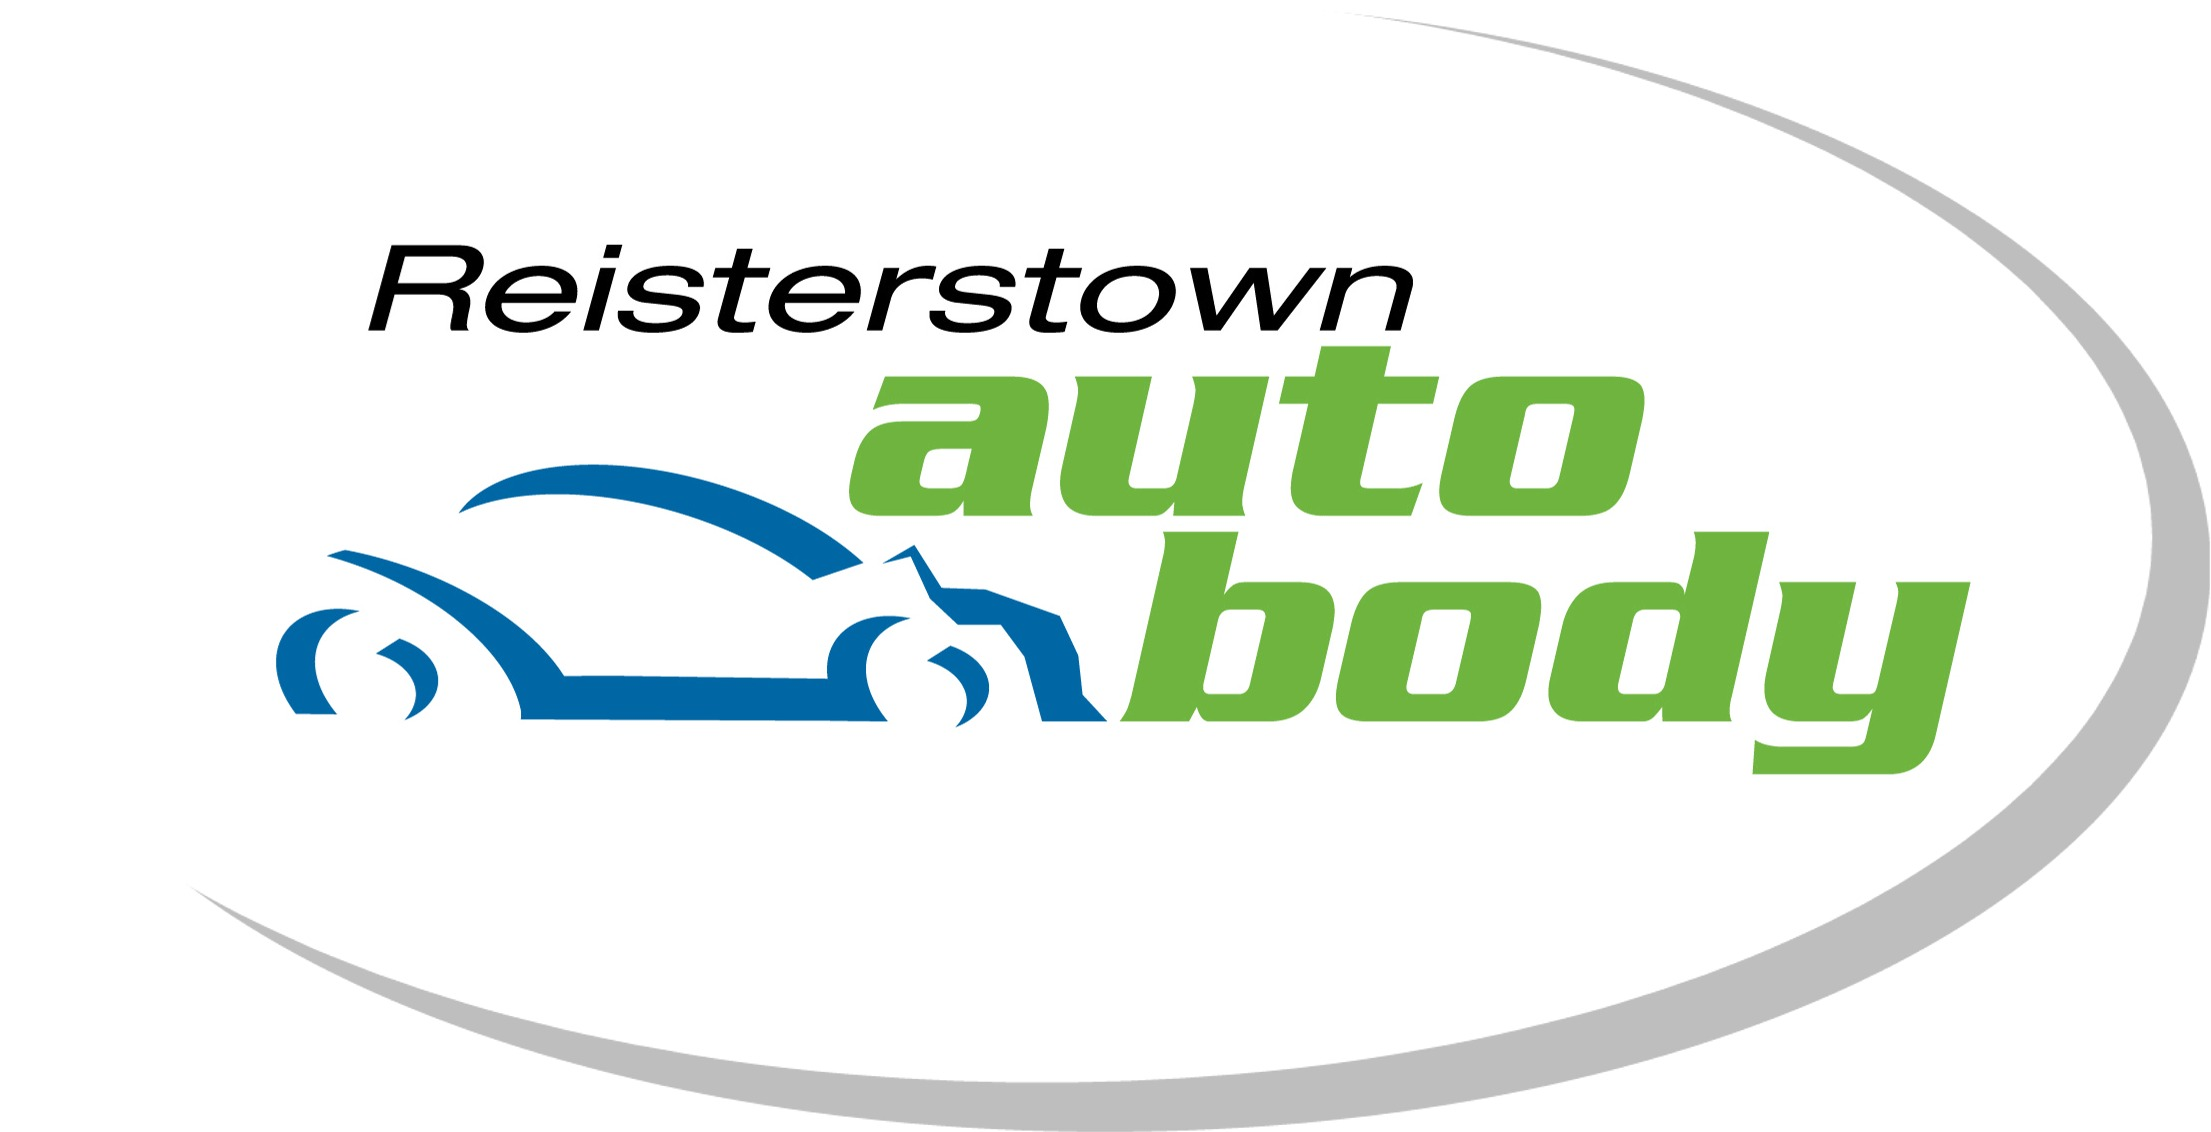 Reisterstown Auto Body - Reisterstown, MD 21136 - (410) 833-2271 | ShowMeLocal.com